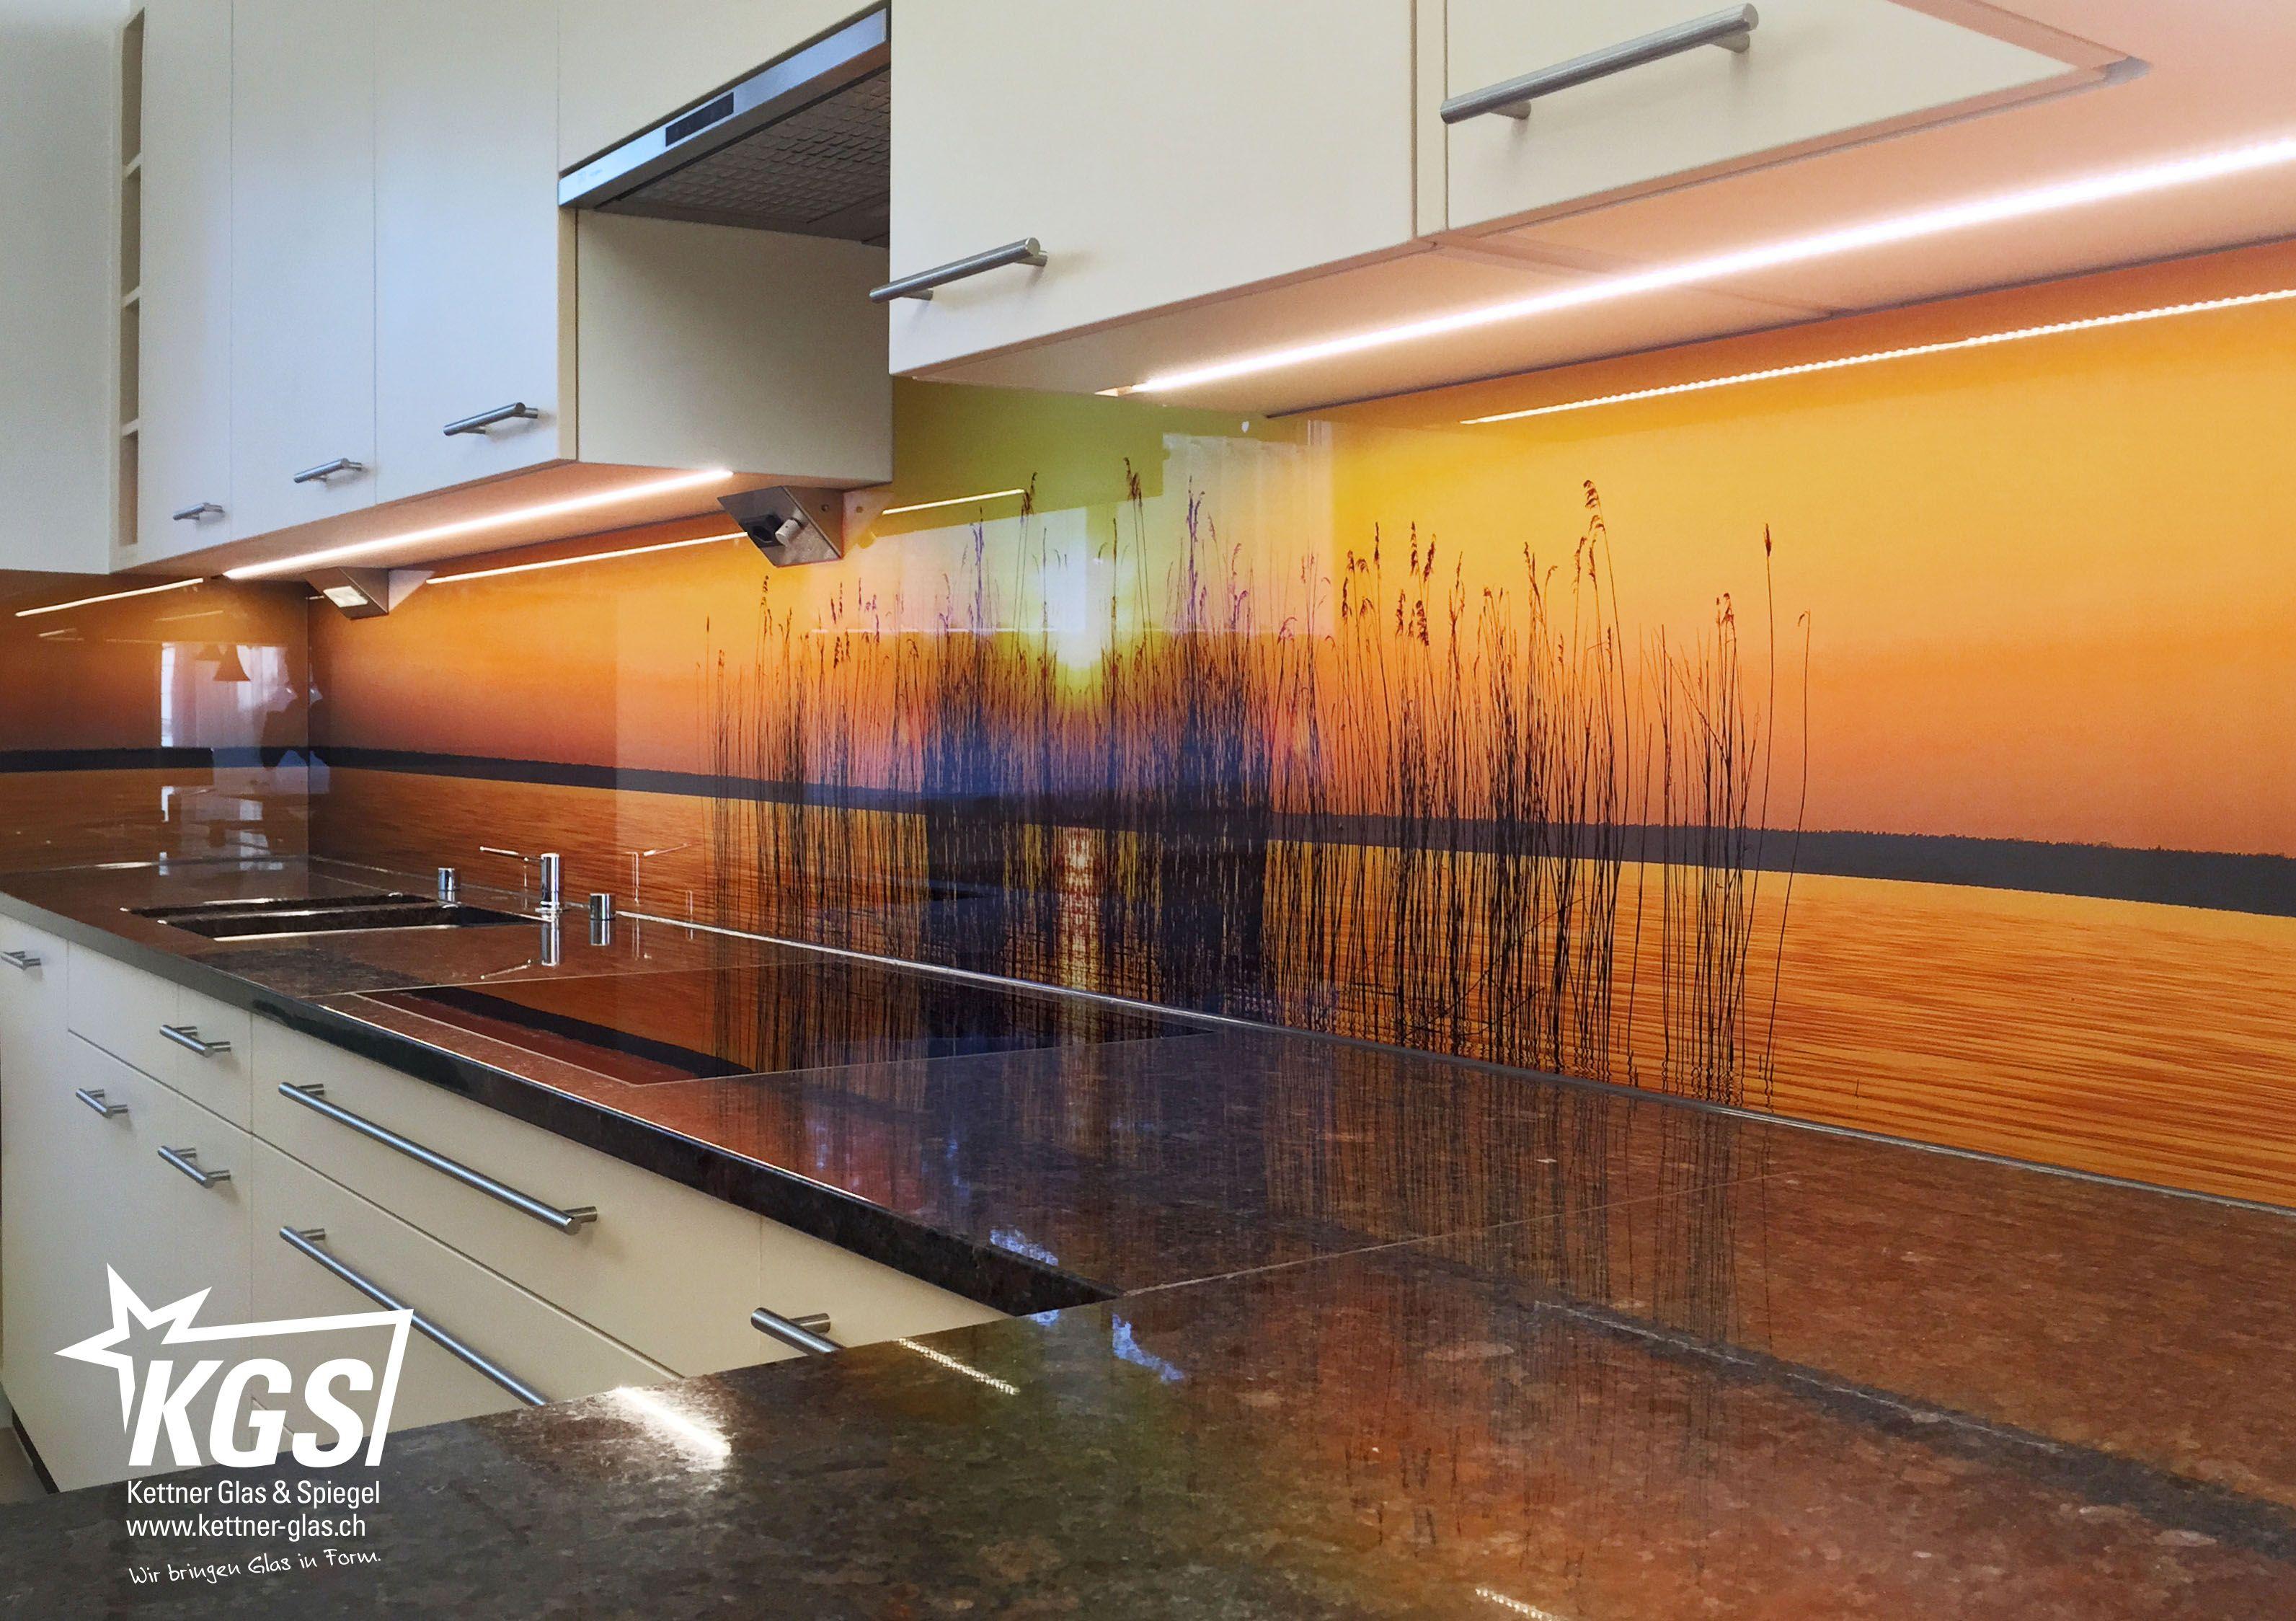 Kuchenruckwand Mit Individuellem Motivdruck In Der Ansicht Von Unten Kuchenruckwand Kuchenruckwand Glas Motiv Wand